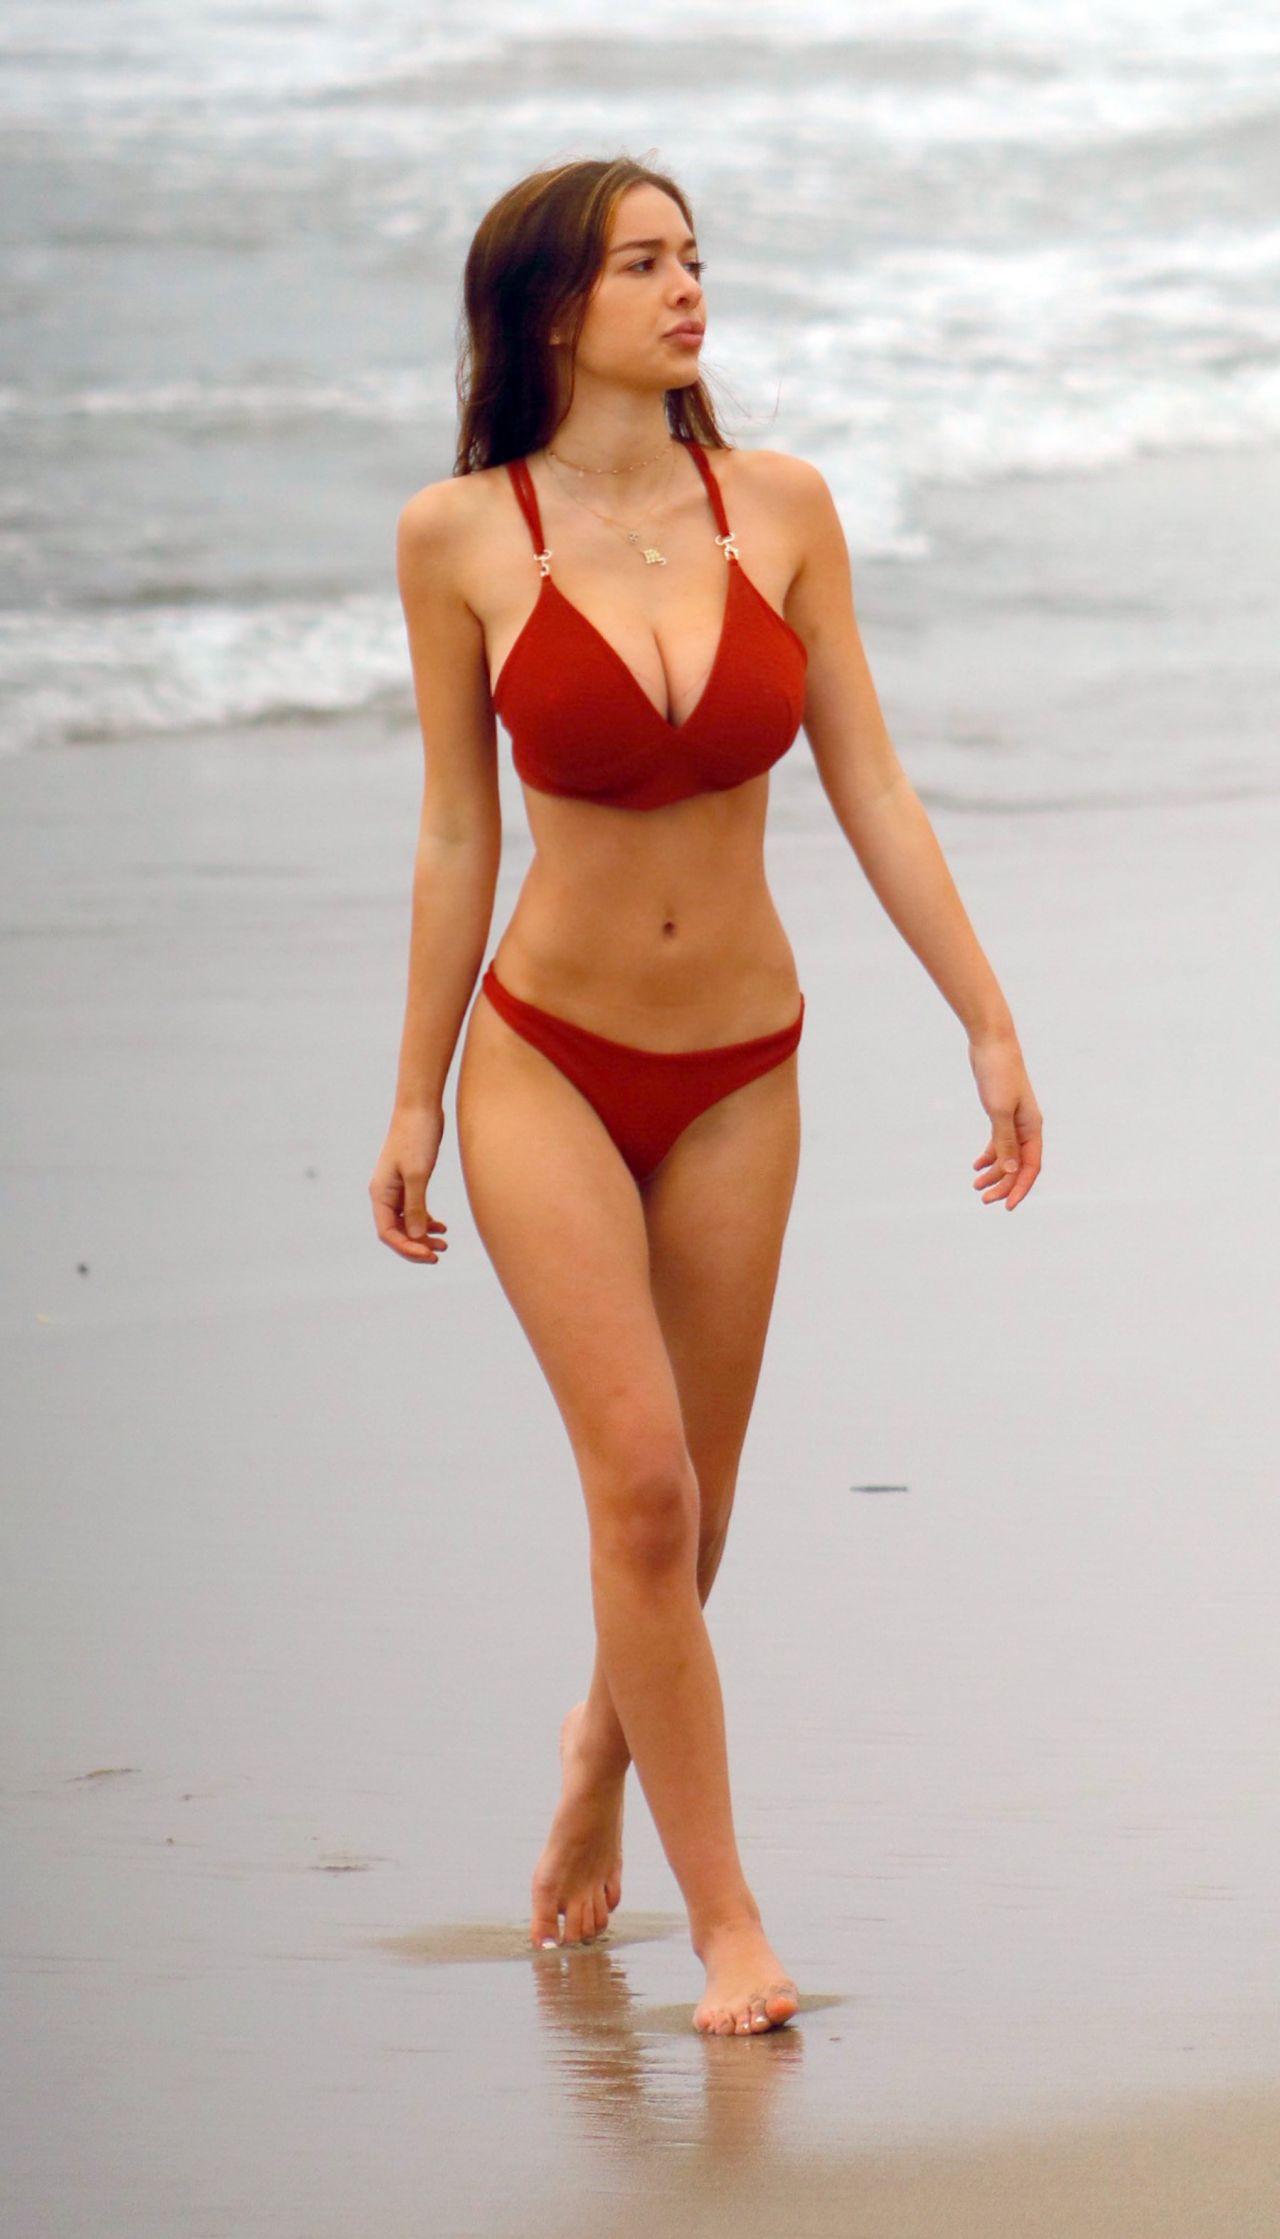 Sophie Mudd in Red Bikini on the beach in Malibu